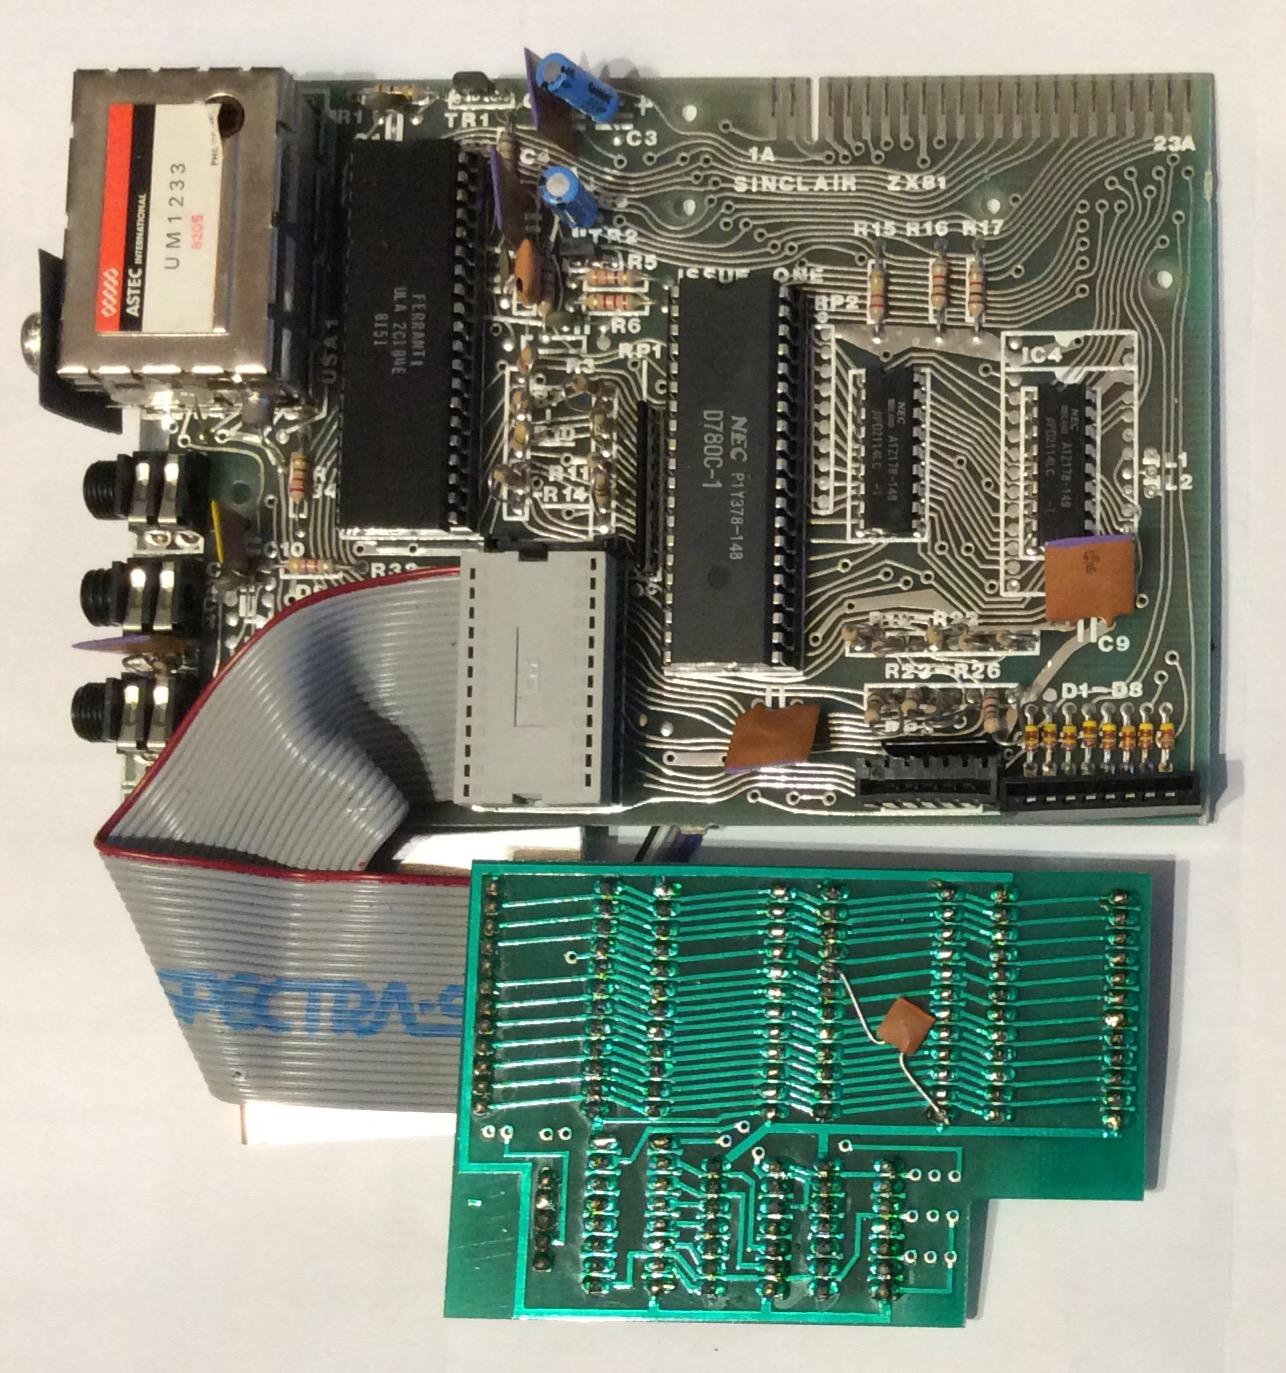 Dktronics 4k Graphics Rom Page 2 Sinclair Zx80 Zx81 Forums Circuit Diagram Image